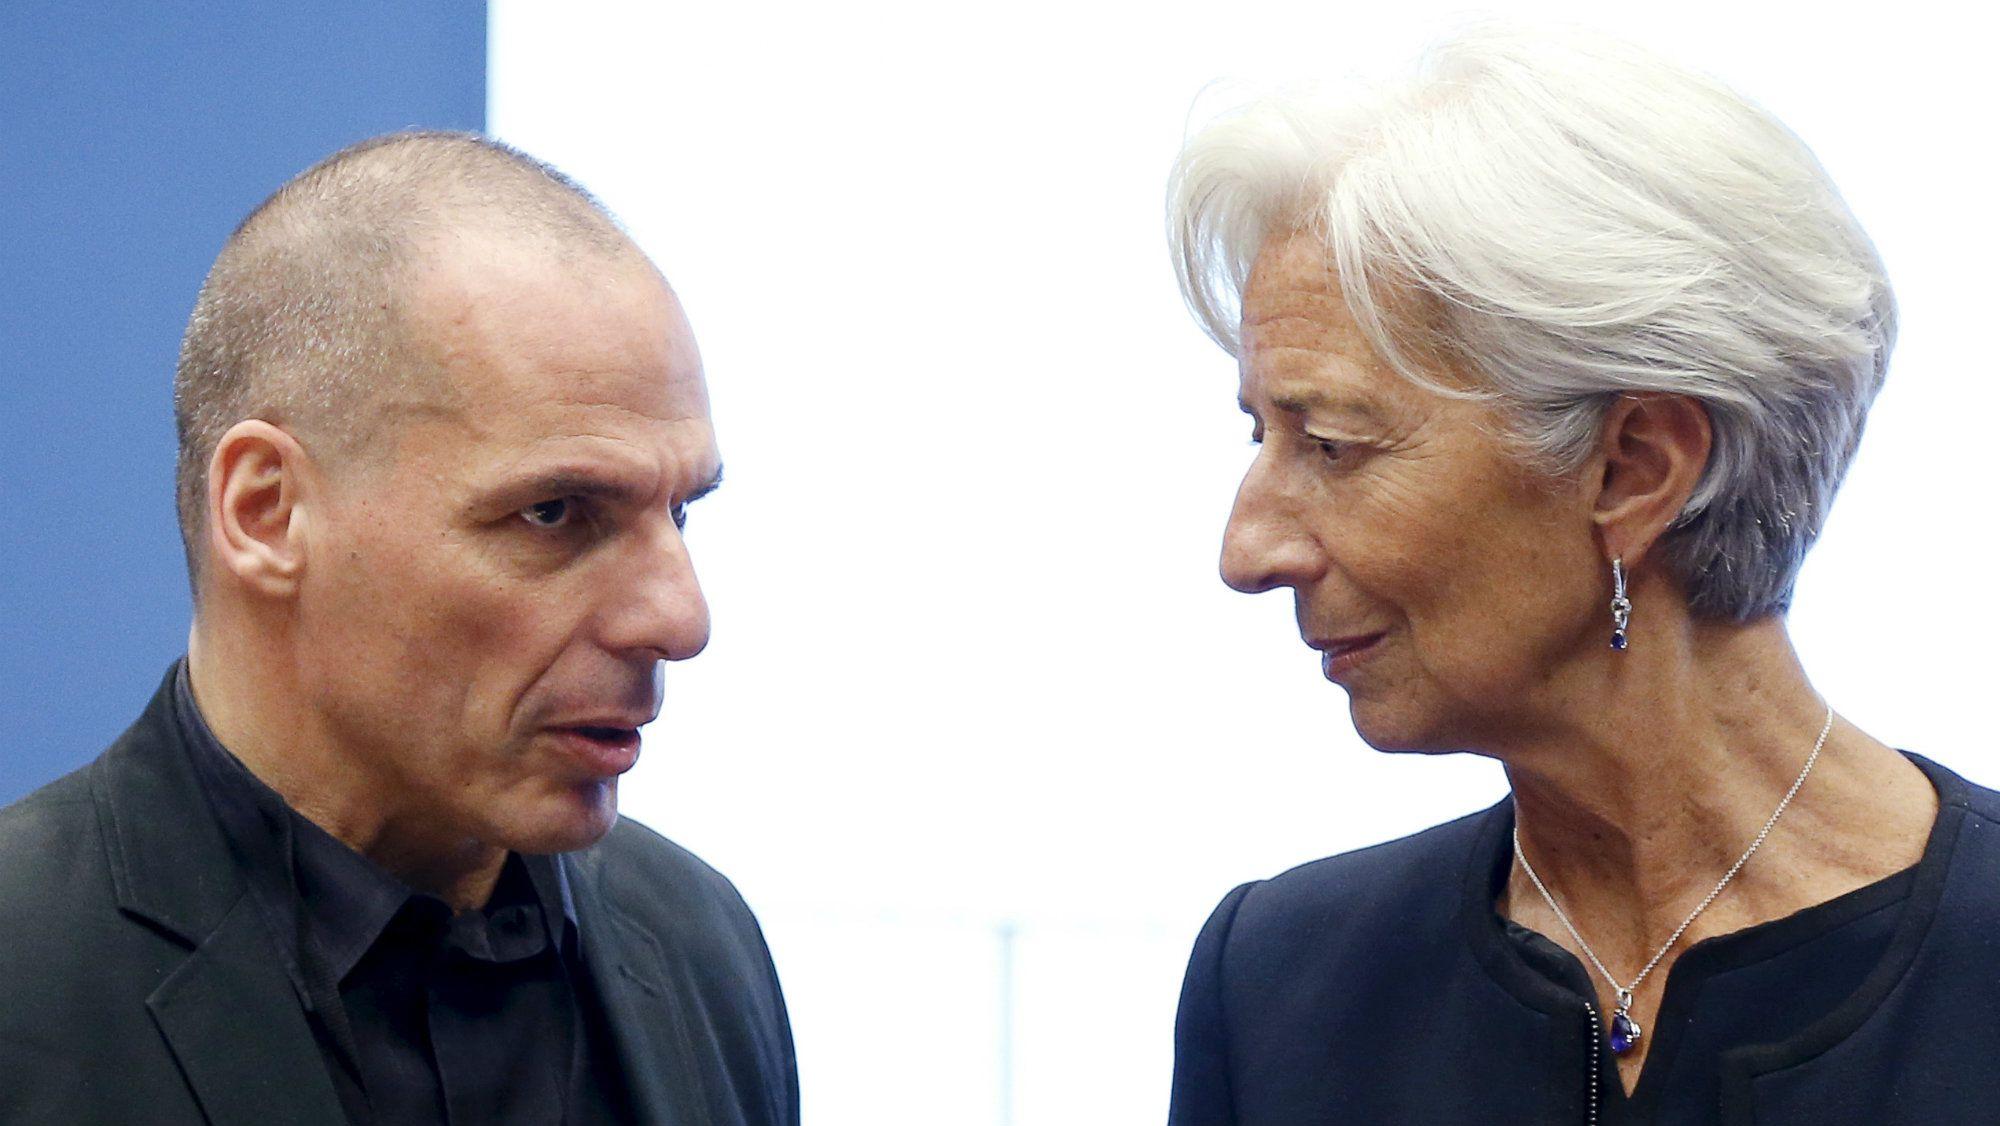 Greek Finance Minister Yanis Varoufakis talks to International Monetary Fund (IMF) Managing Director Christine Lagarde (R) during a euro zone finance ministers meeting.